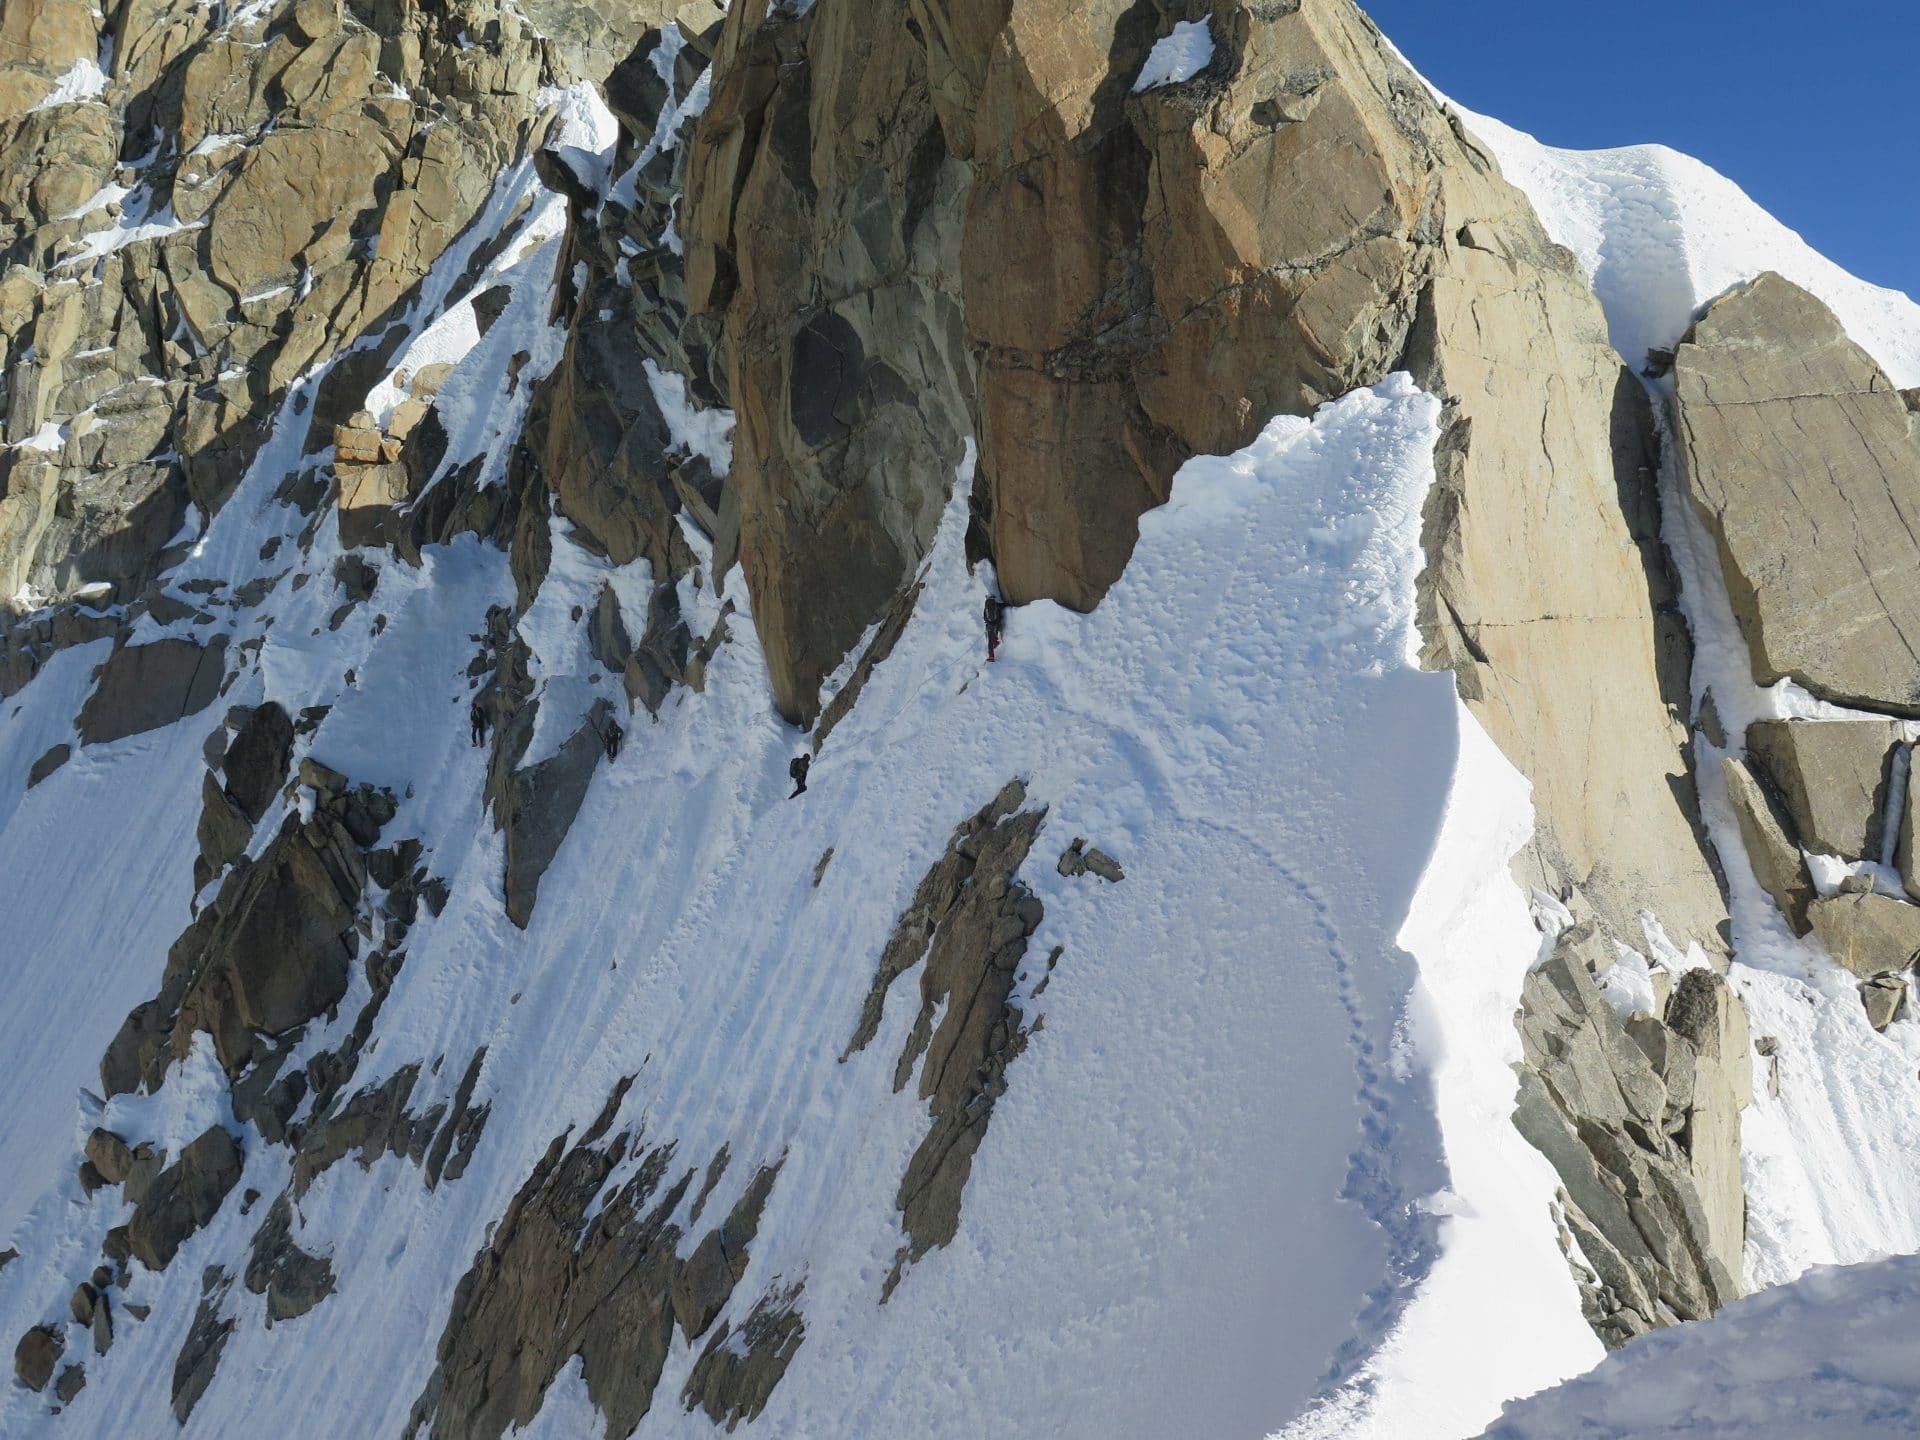 Helyum_Xavier-Carrard_guide-de-montagne_Alpinisme_arete-Kufner_Mont-Maudit_France_4